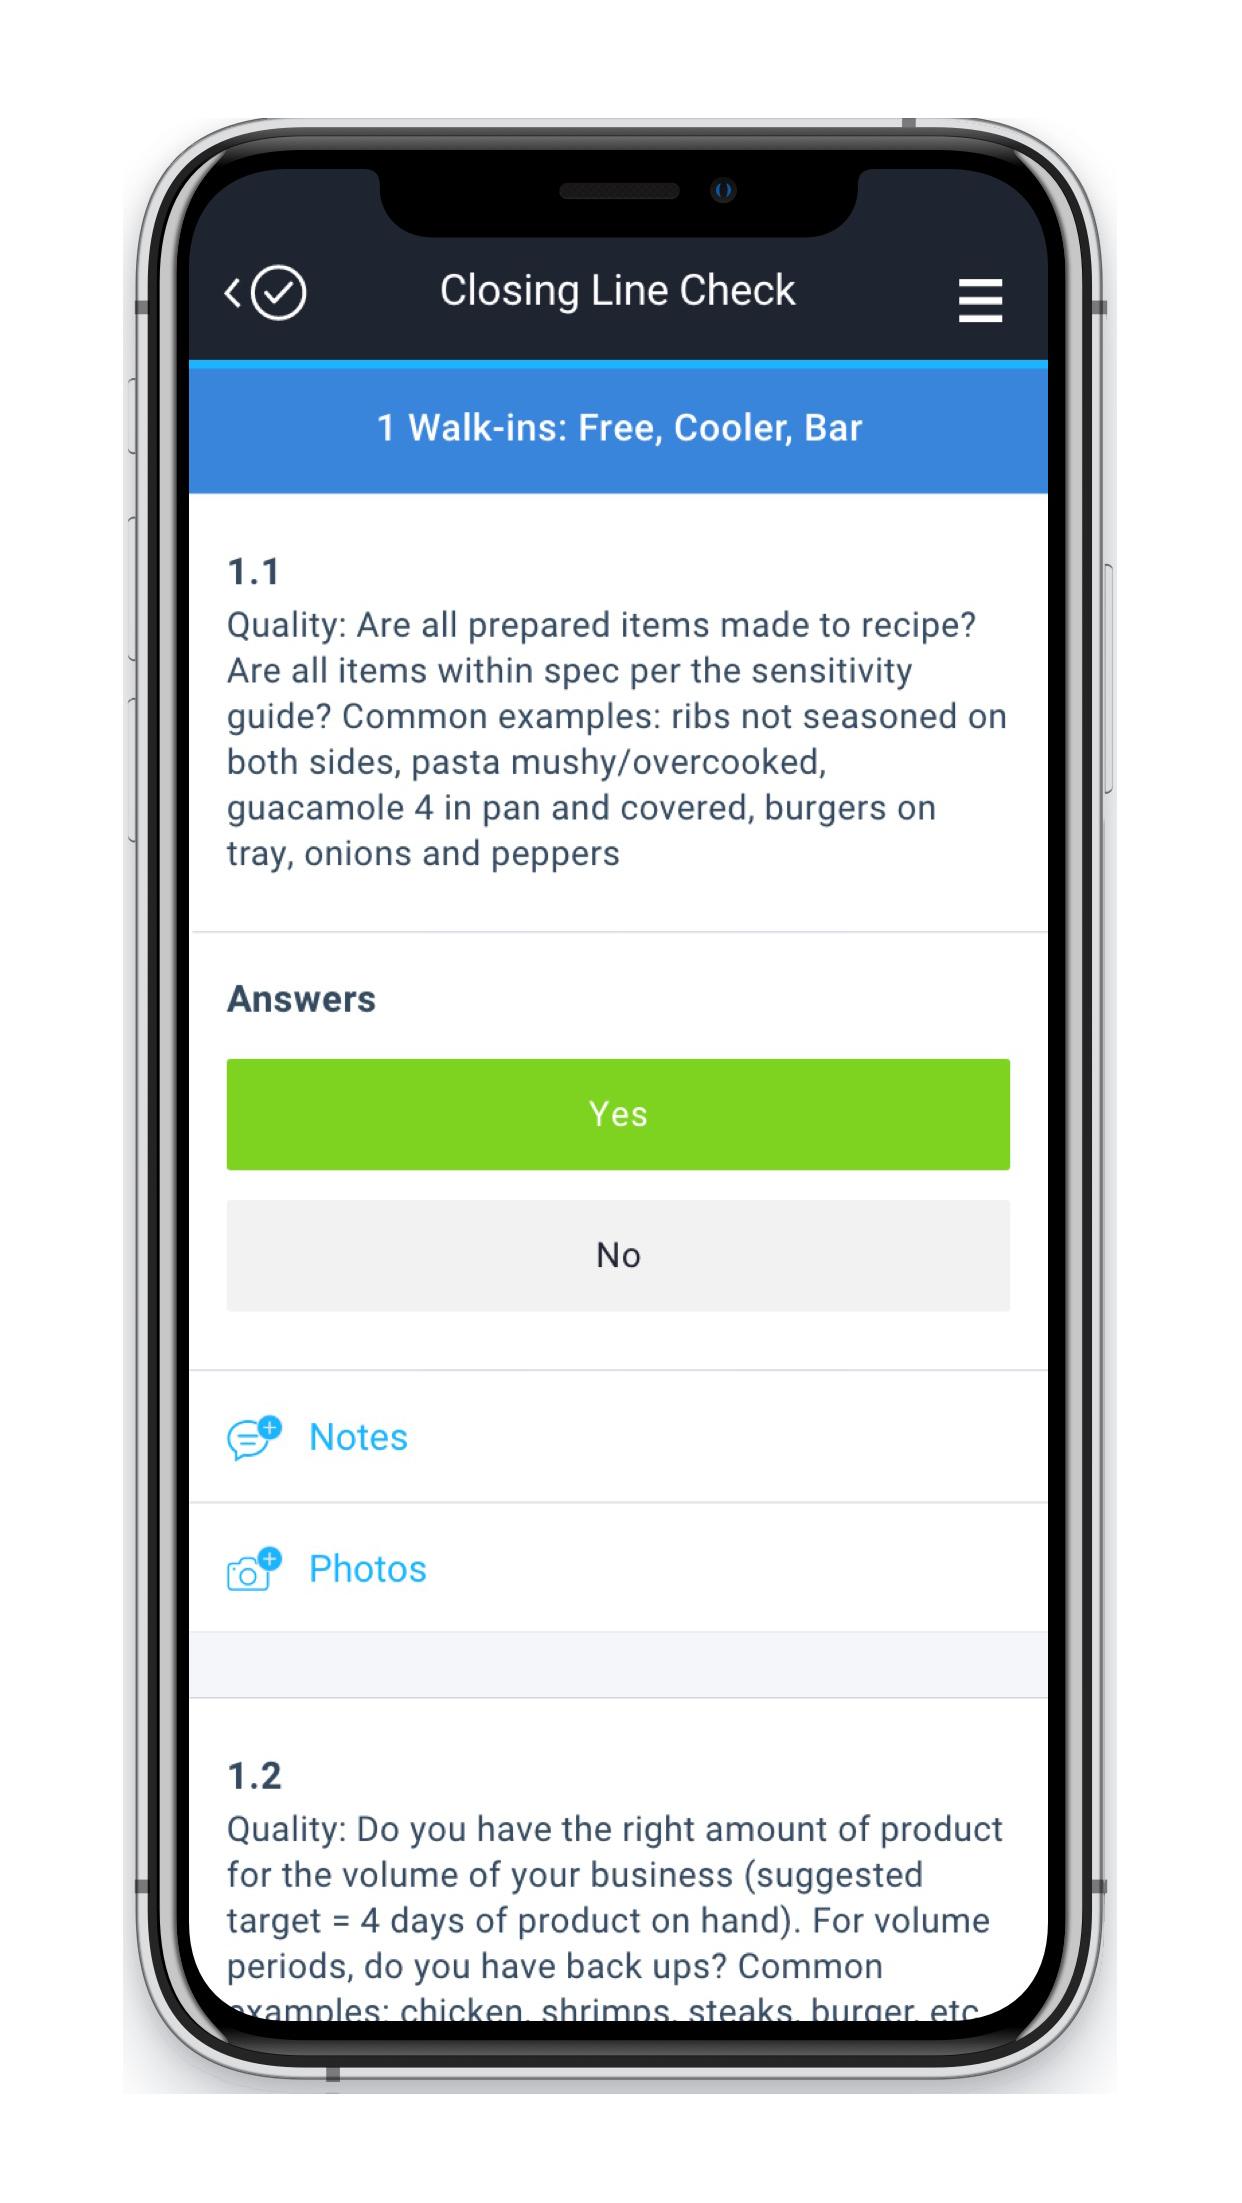 Therma Digital Checklist App - Customizable